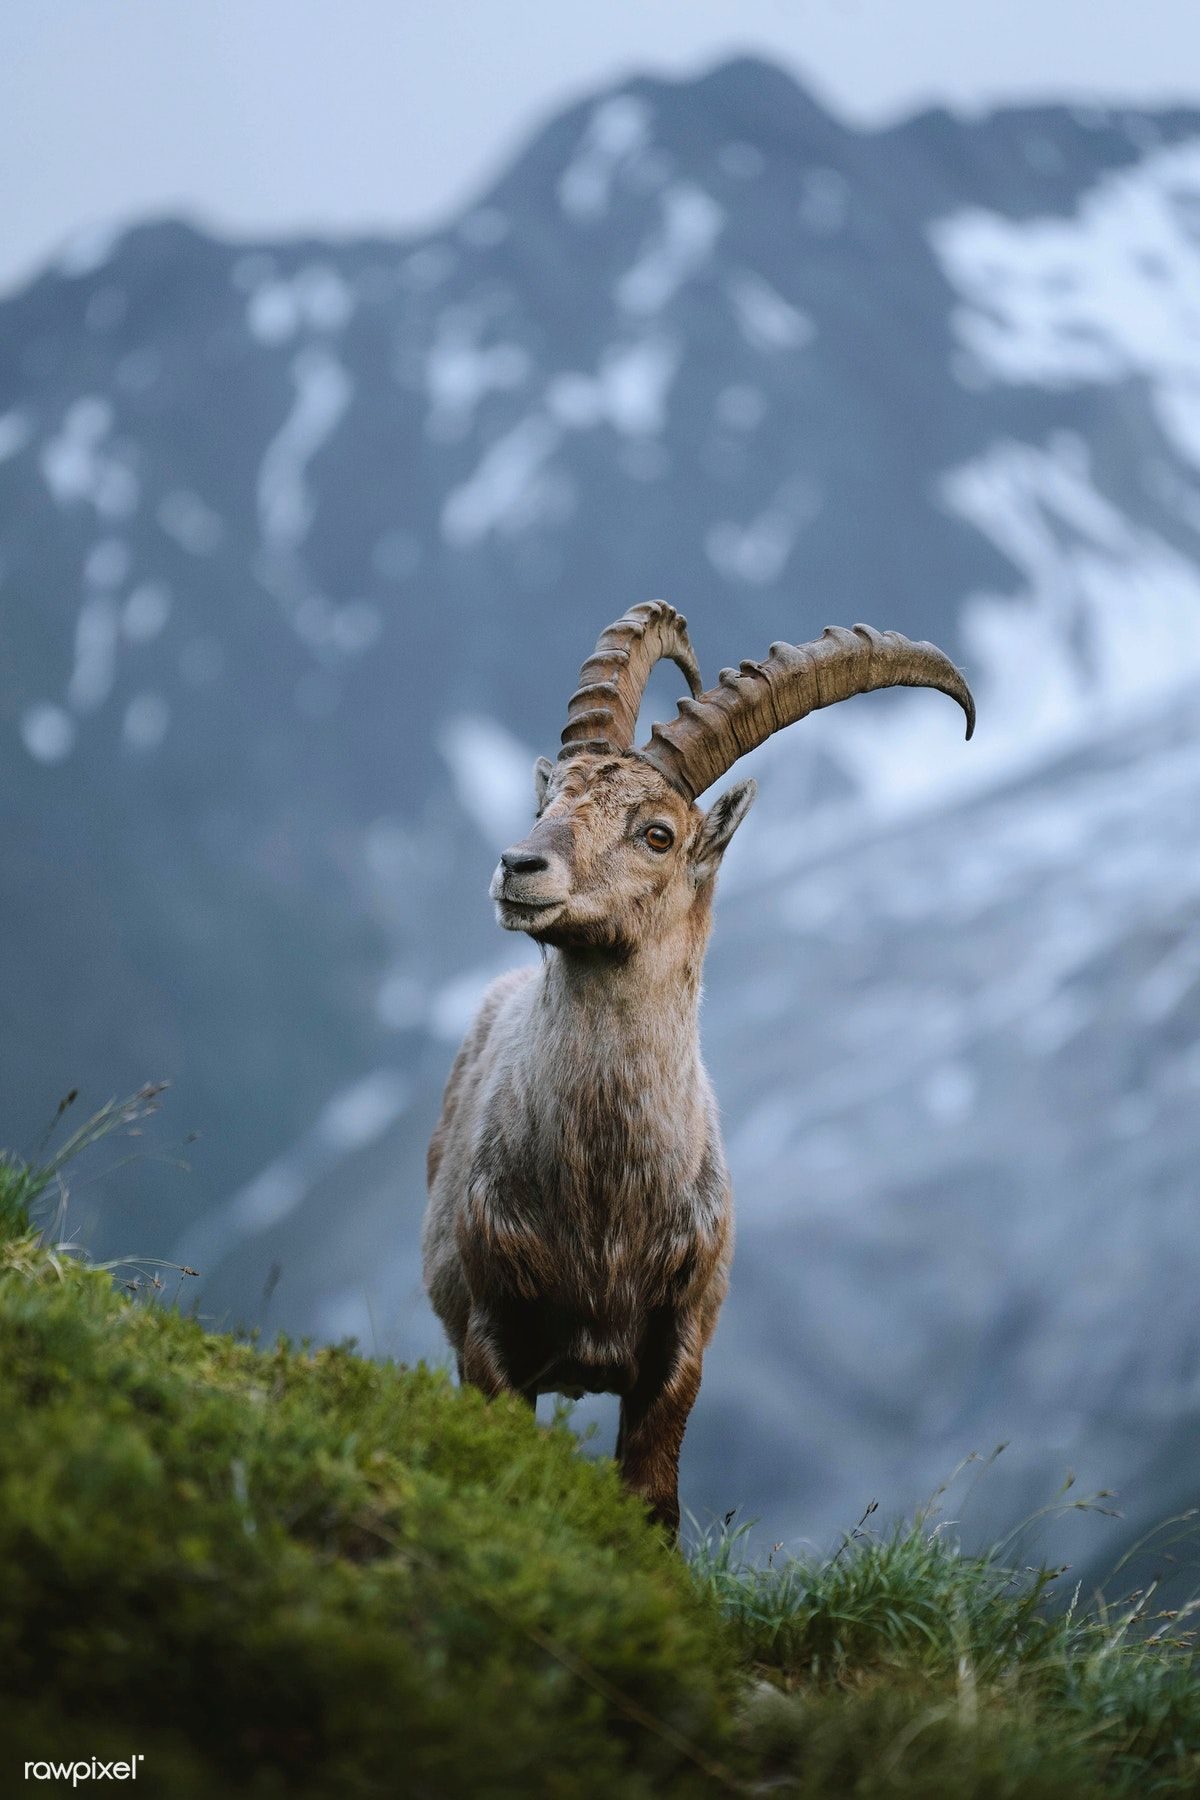 Alpine ibex in Chamonix Alps in France   free image by rawpixel.com  #picture #photography #inspiration #photo #art #animal   Alpine ibex, Ibex,  Alps